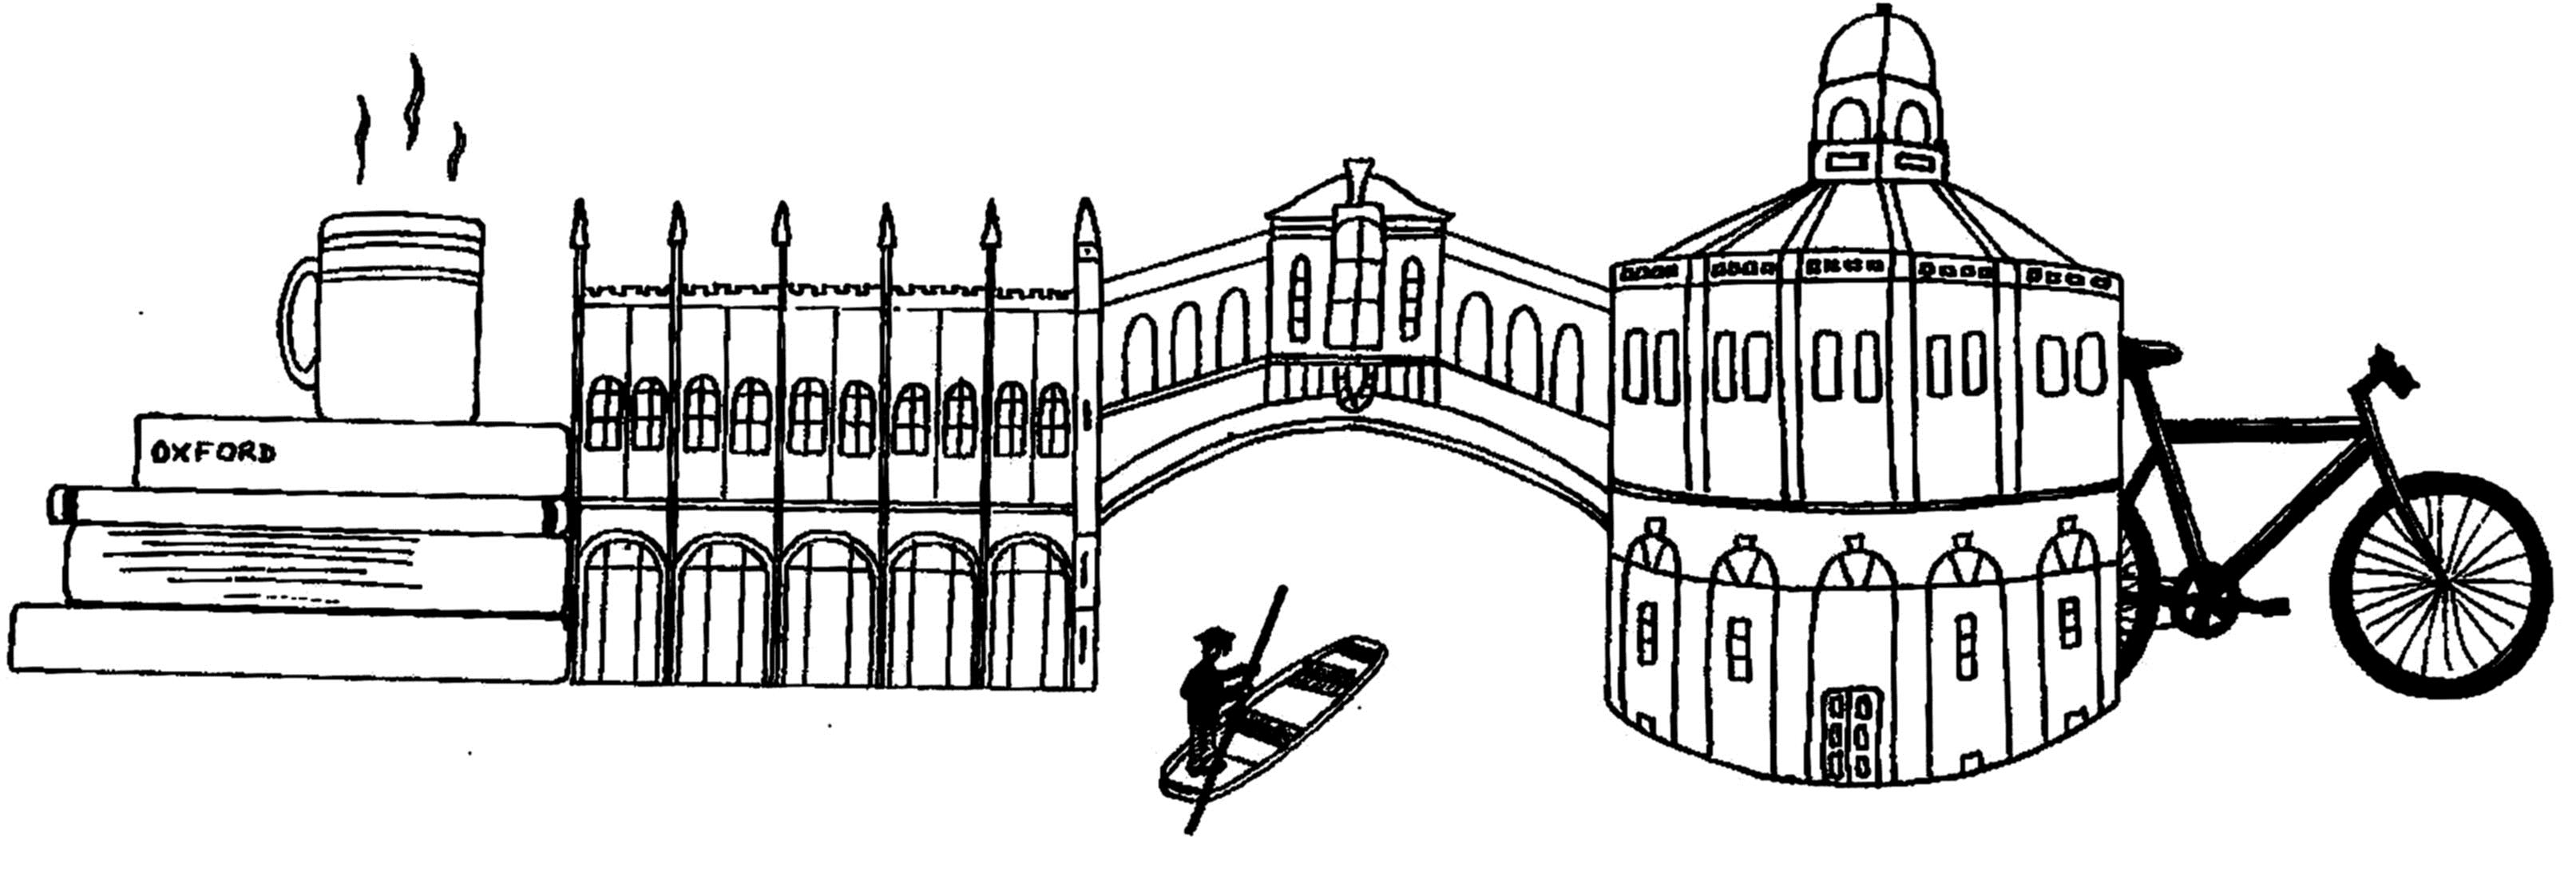 Illustration of Oxford